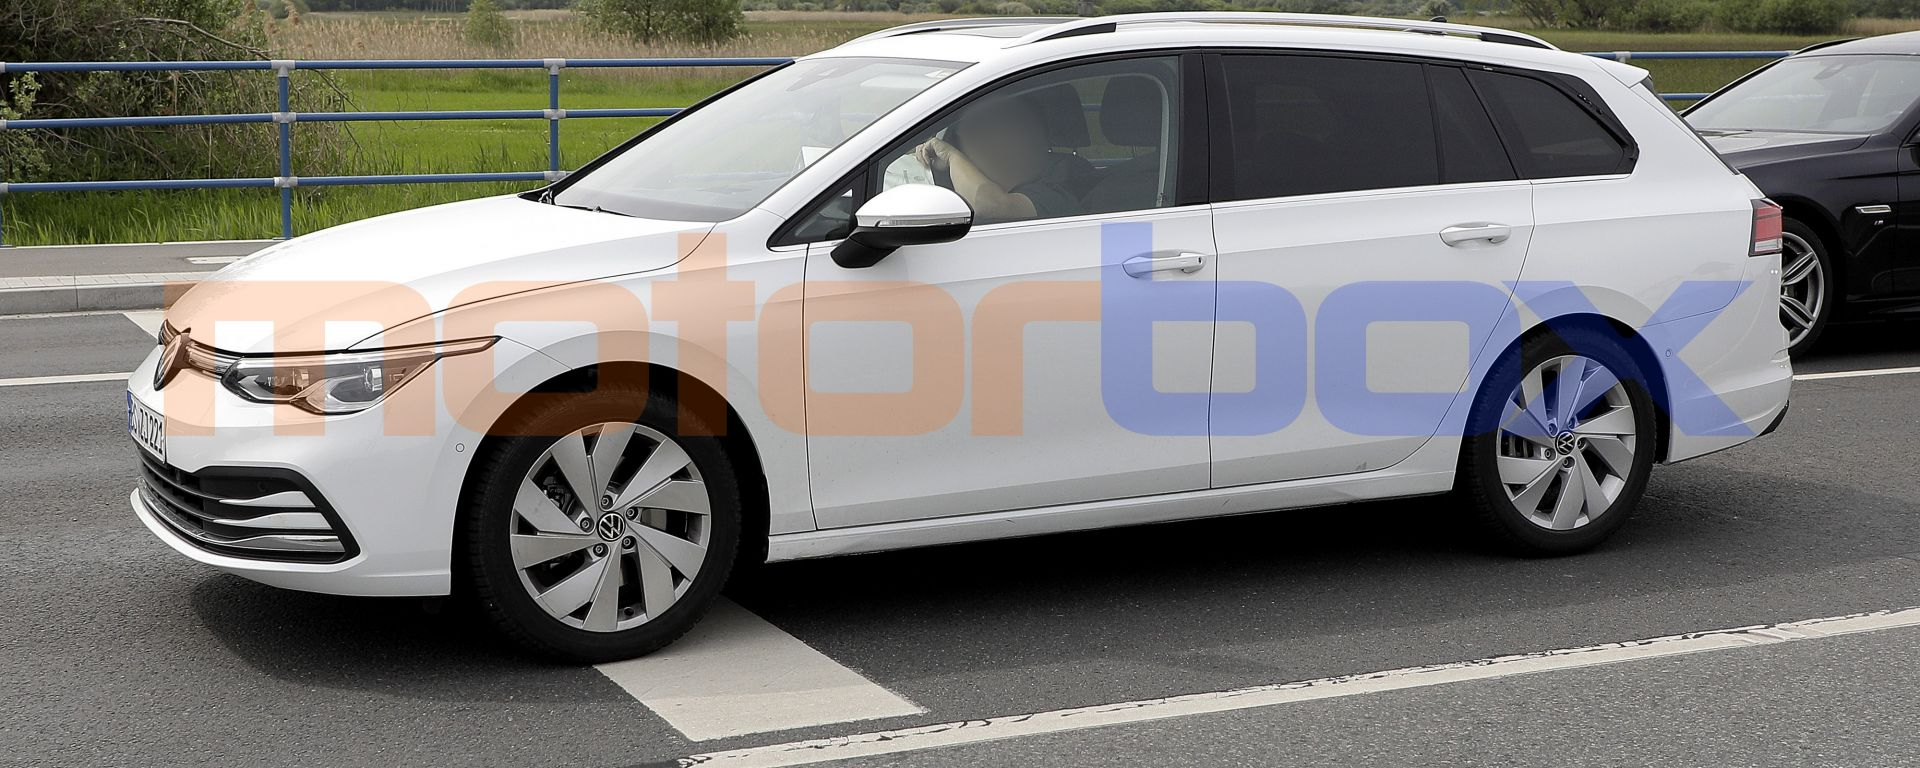 Volkswagen Golf Variant 2021: una foto spia scattata in Germania